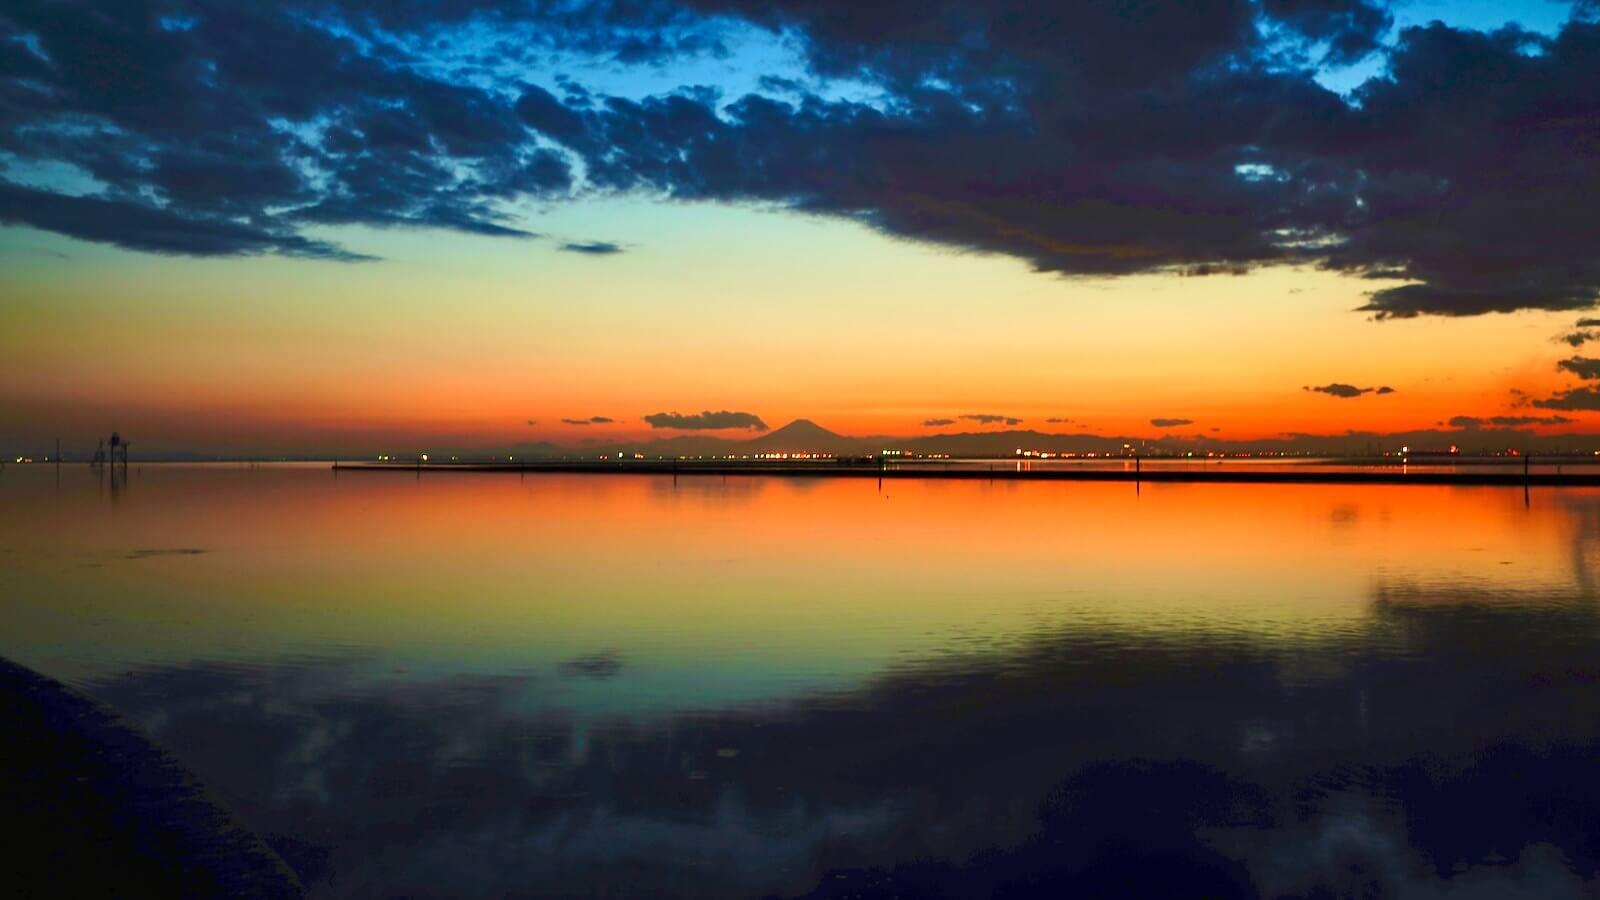 Mt. Fuji at dusk seen from the Kuzuma coast